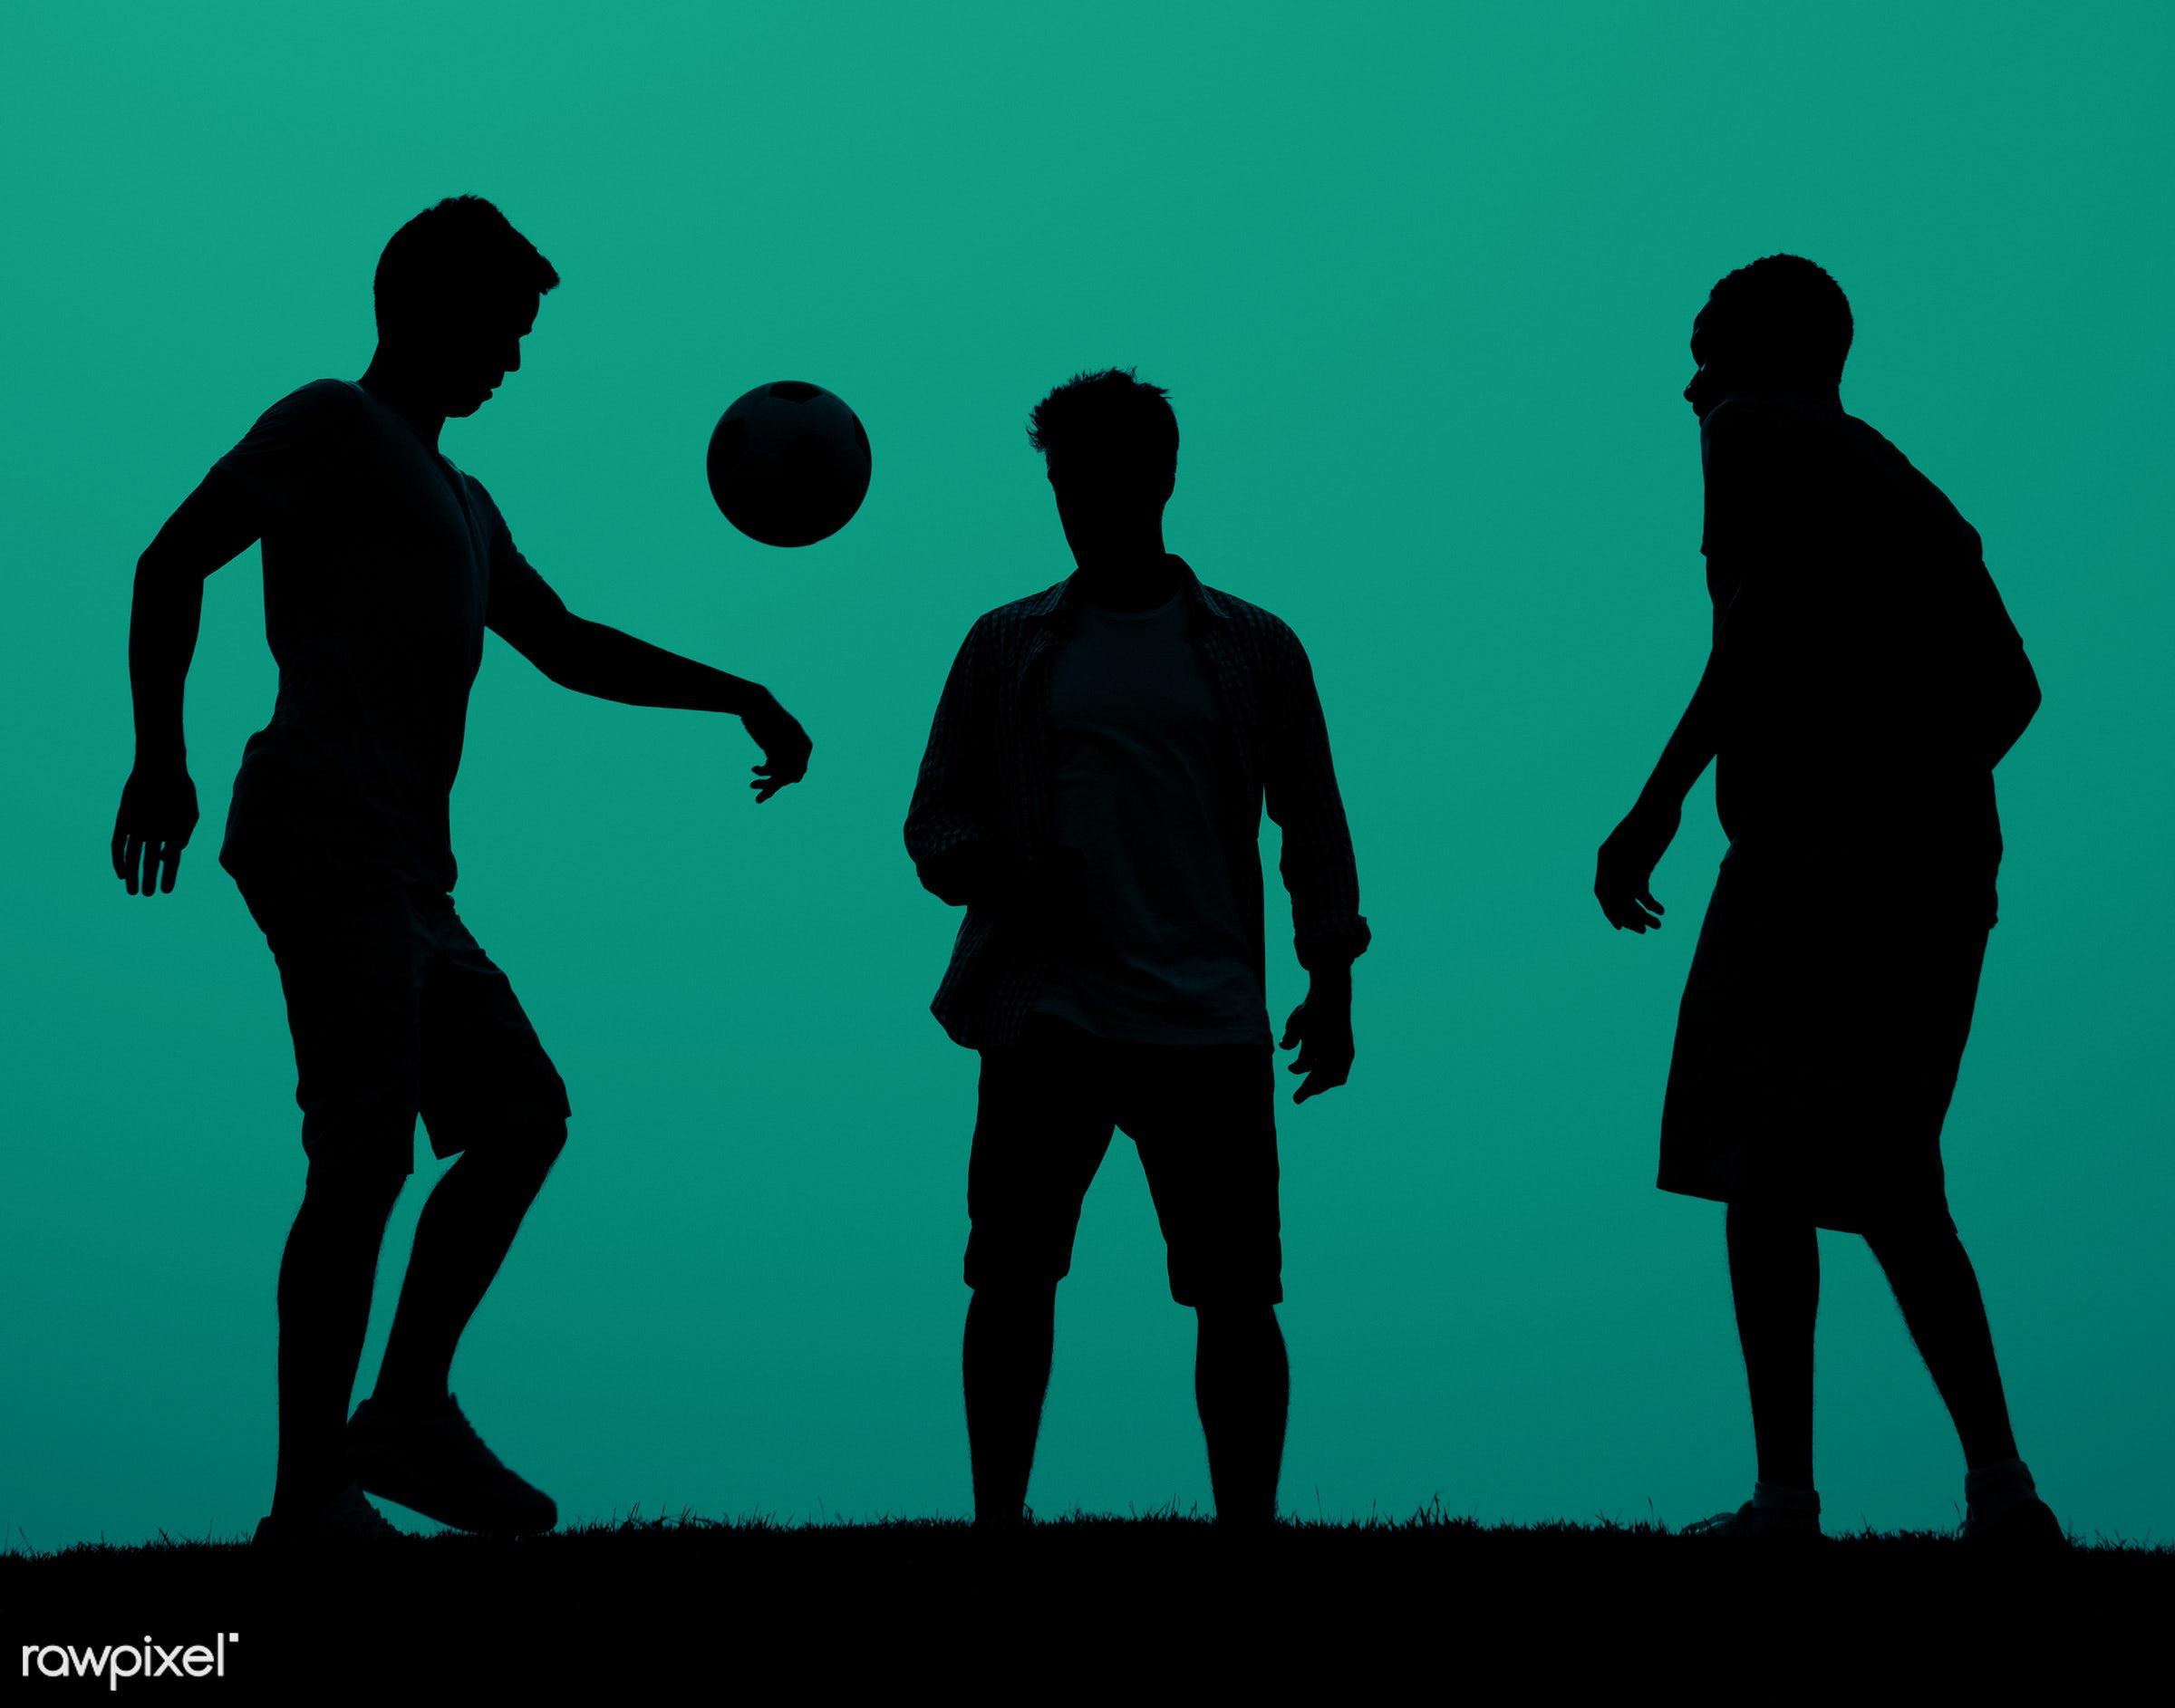 action, active, ball, blue, dusk, evening, field, football, friendship, fun, game, grass, kicking, leisure activity, leisure...